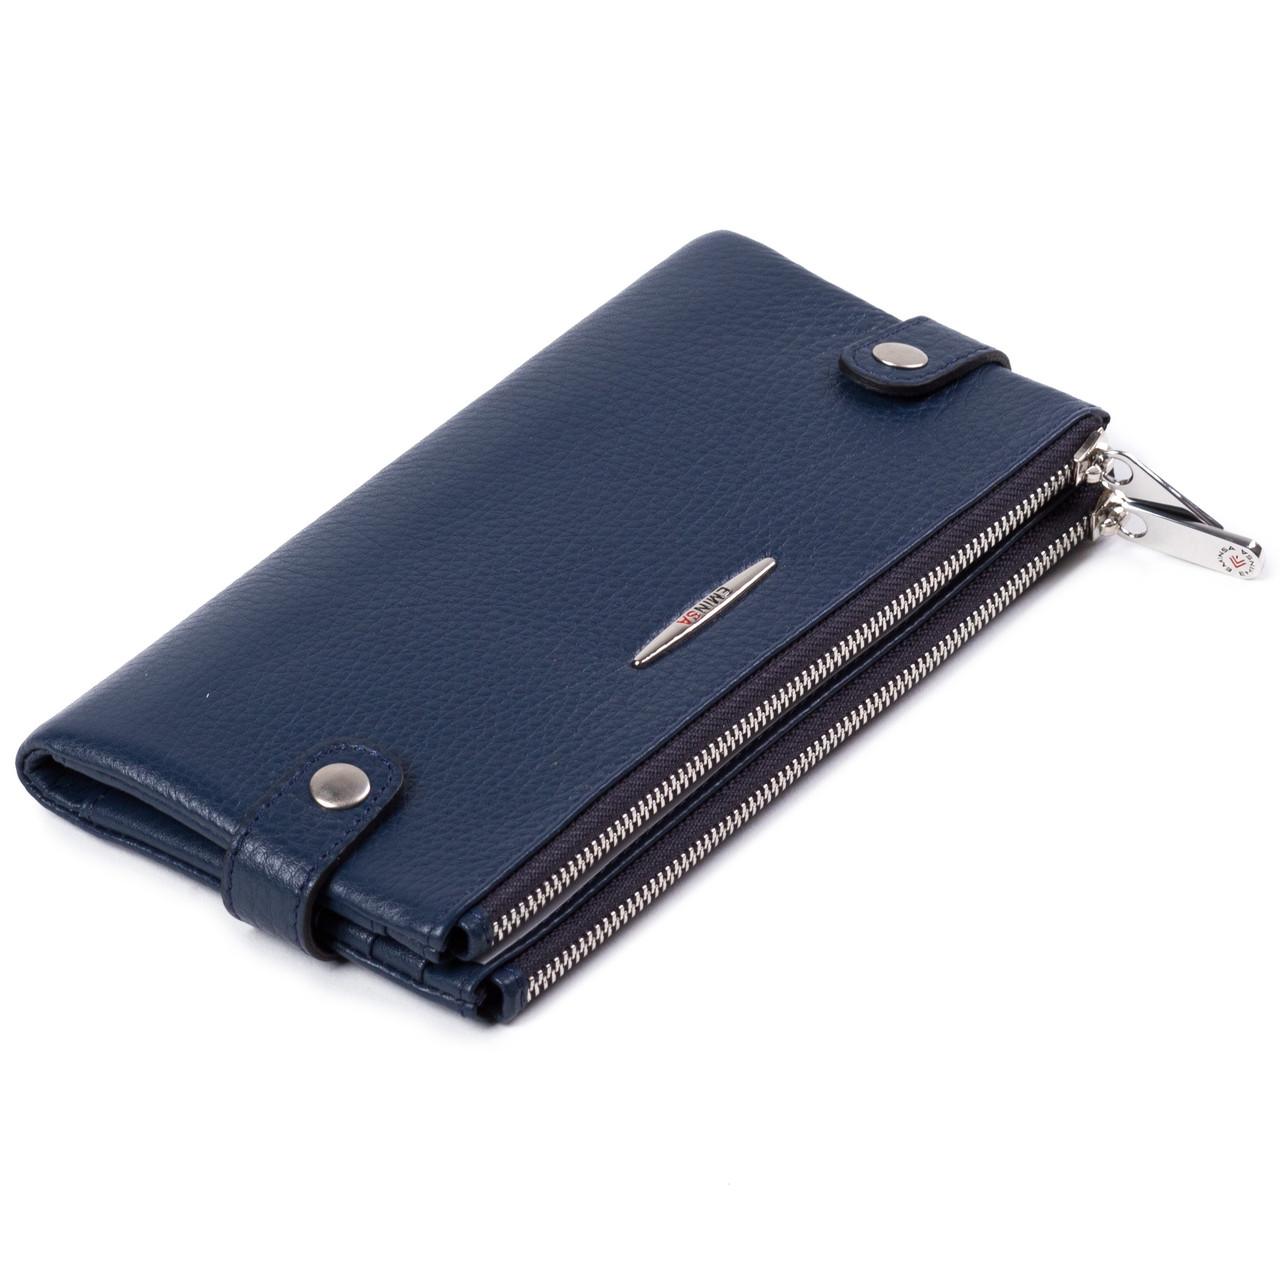 Женский кошелек кожаный синий Eminsa 2117-18-19